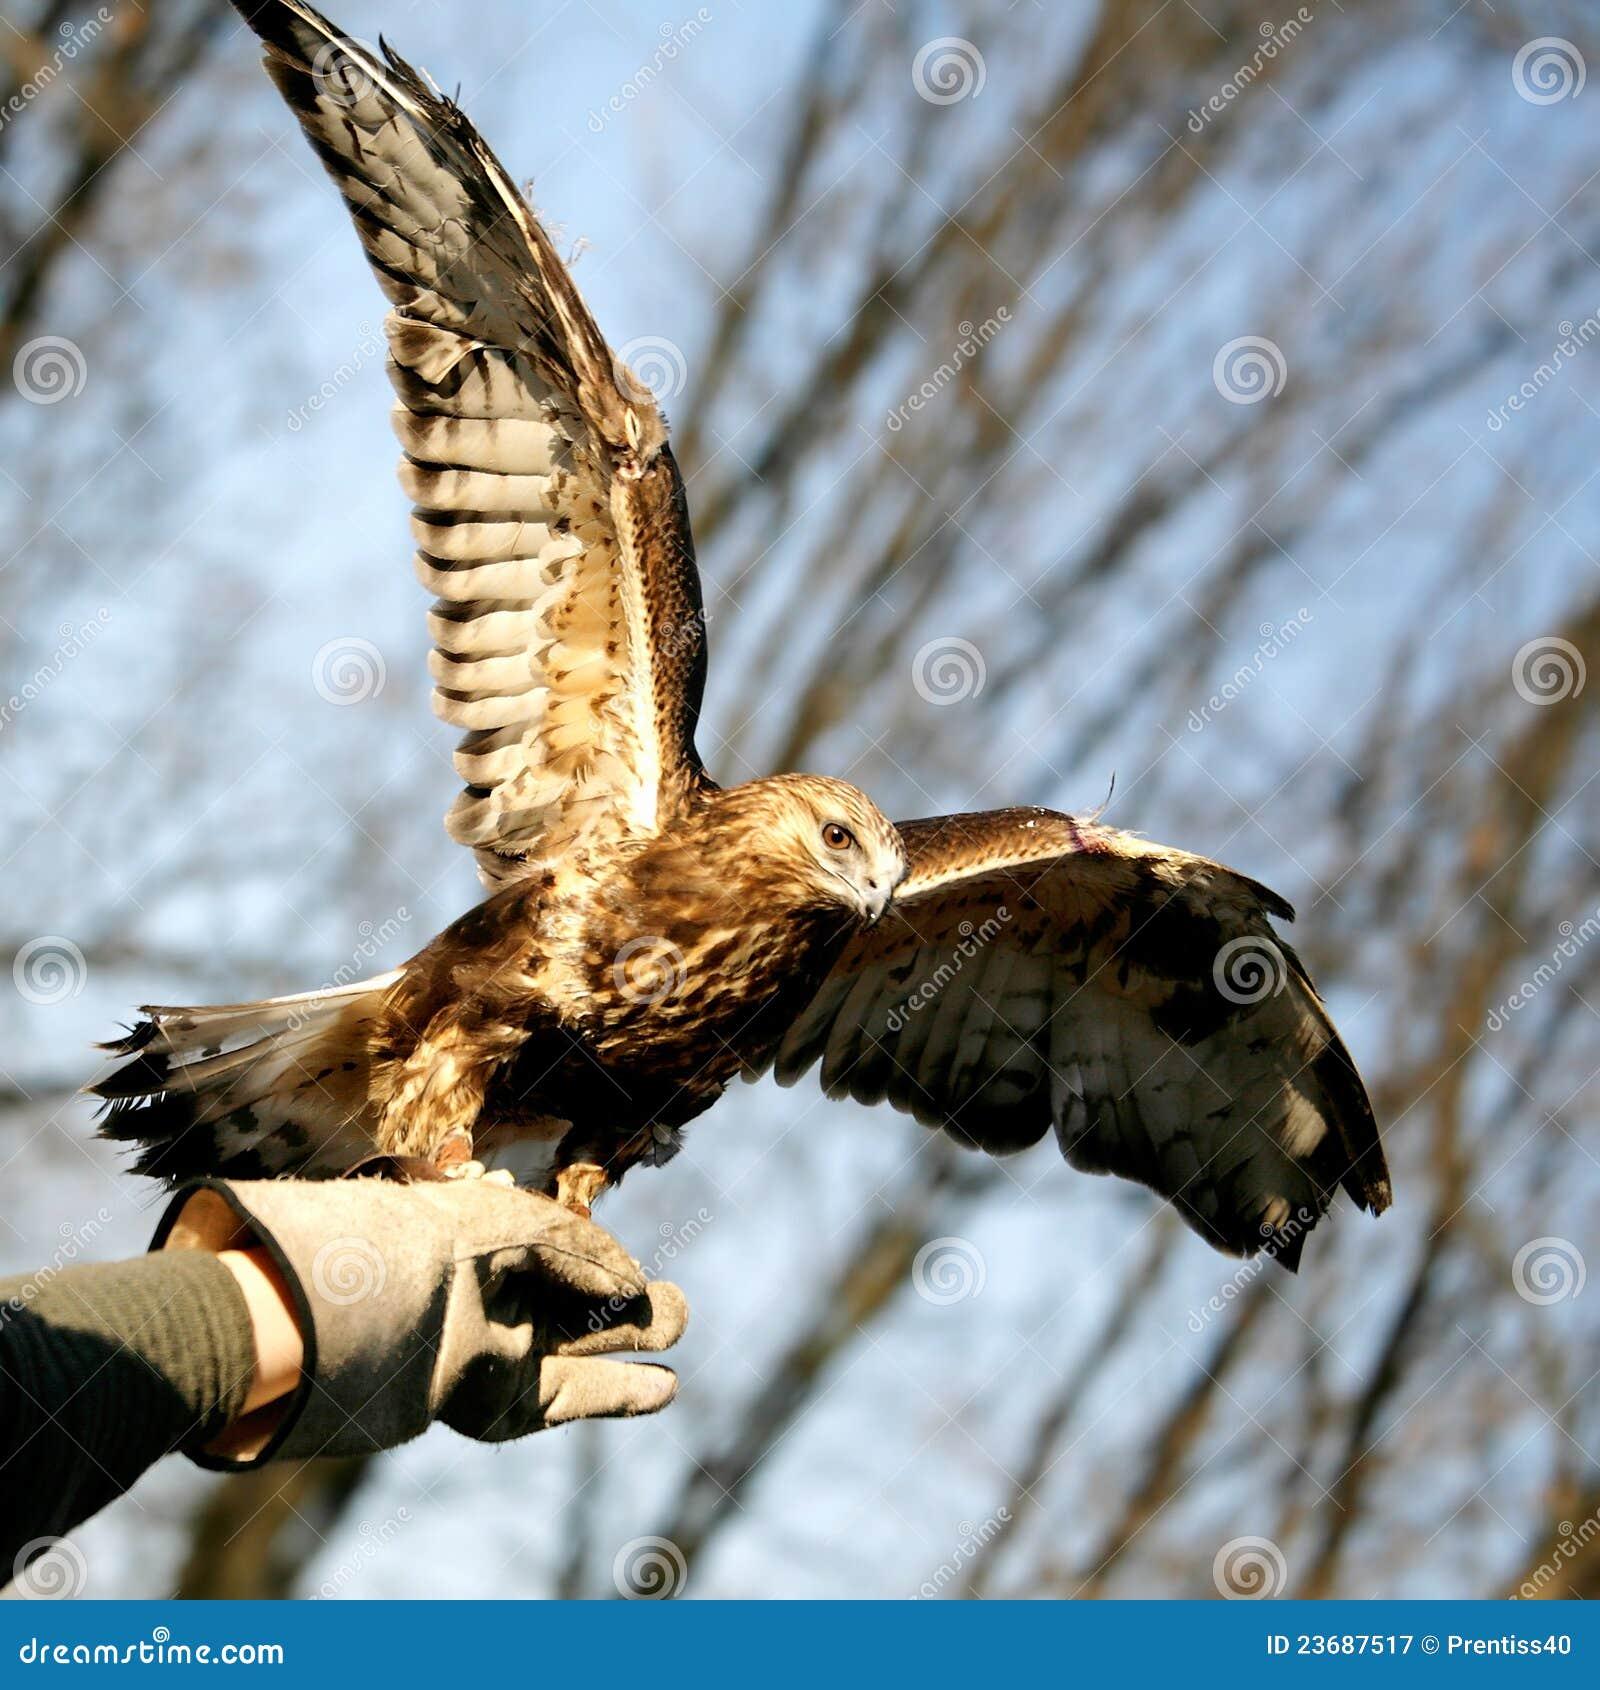 Falcon on master hand